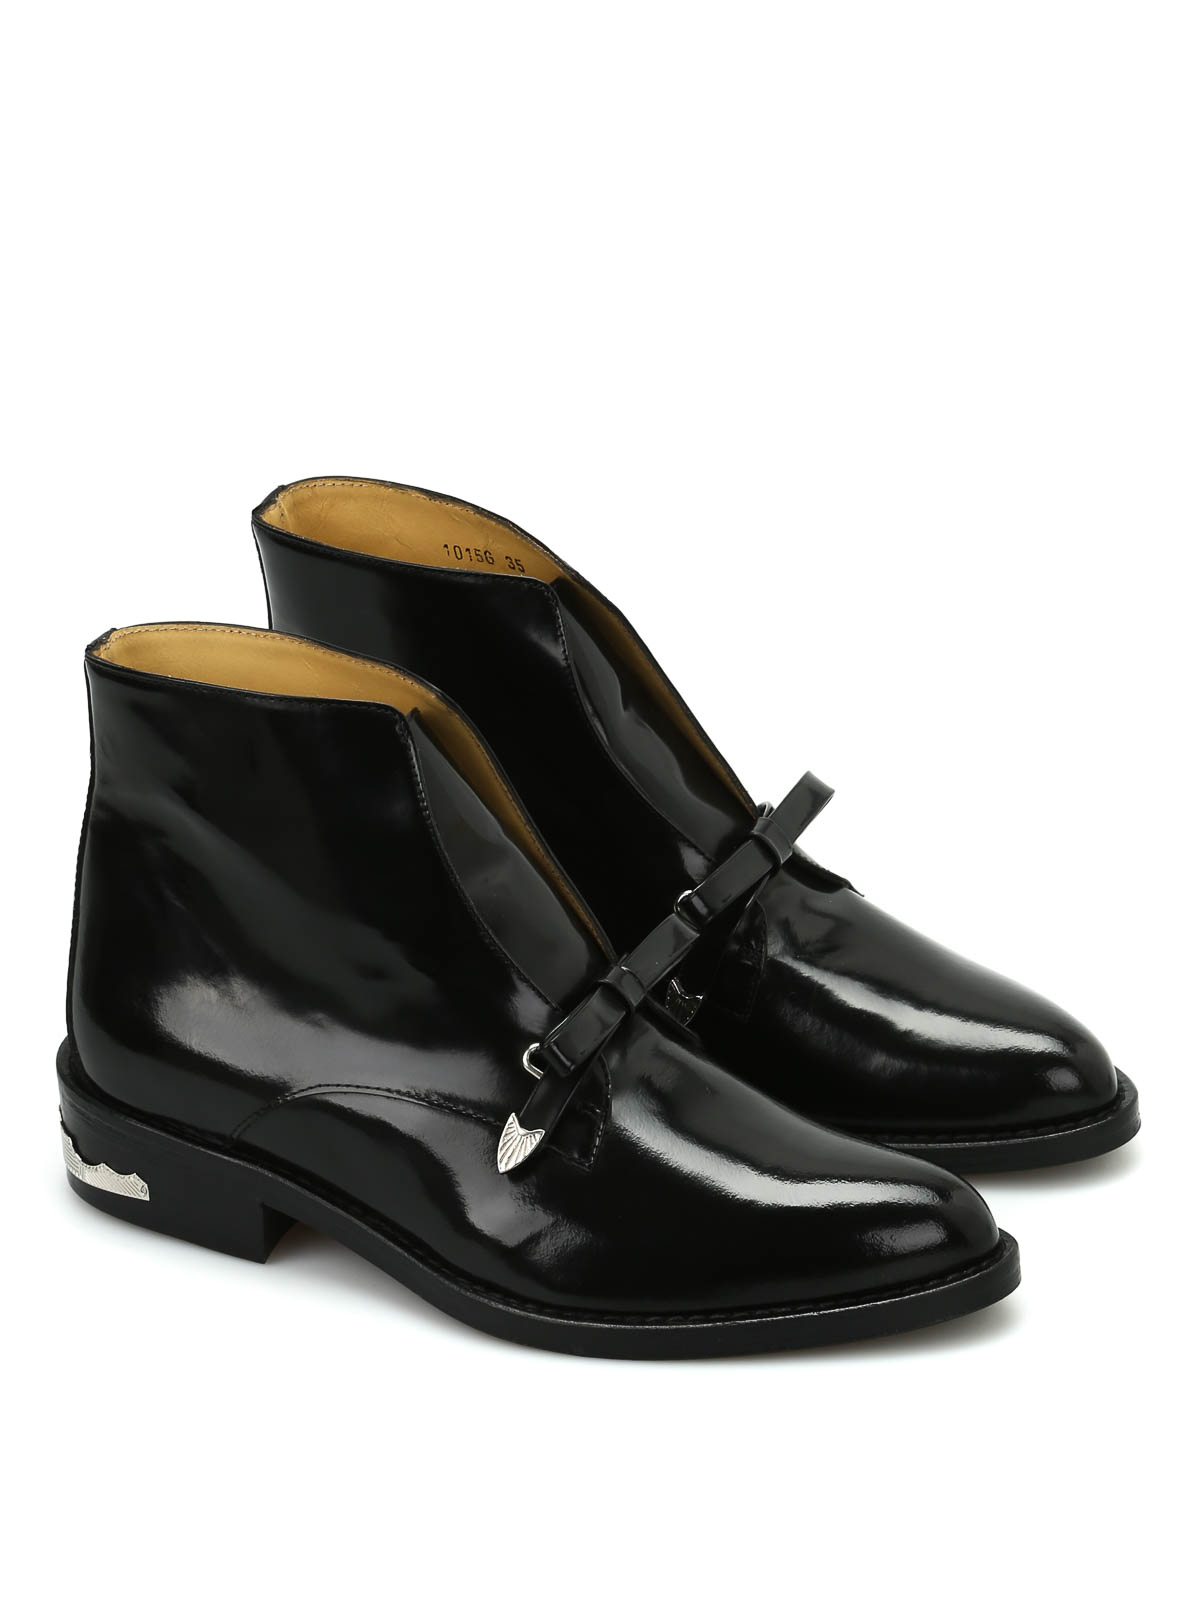 Toga Pulla Shoes Online